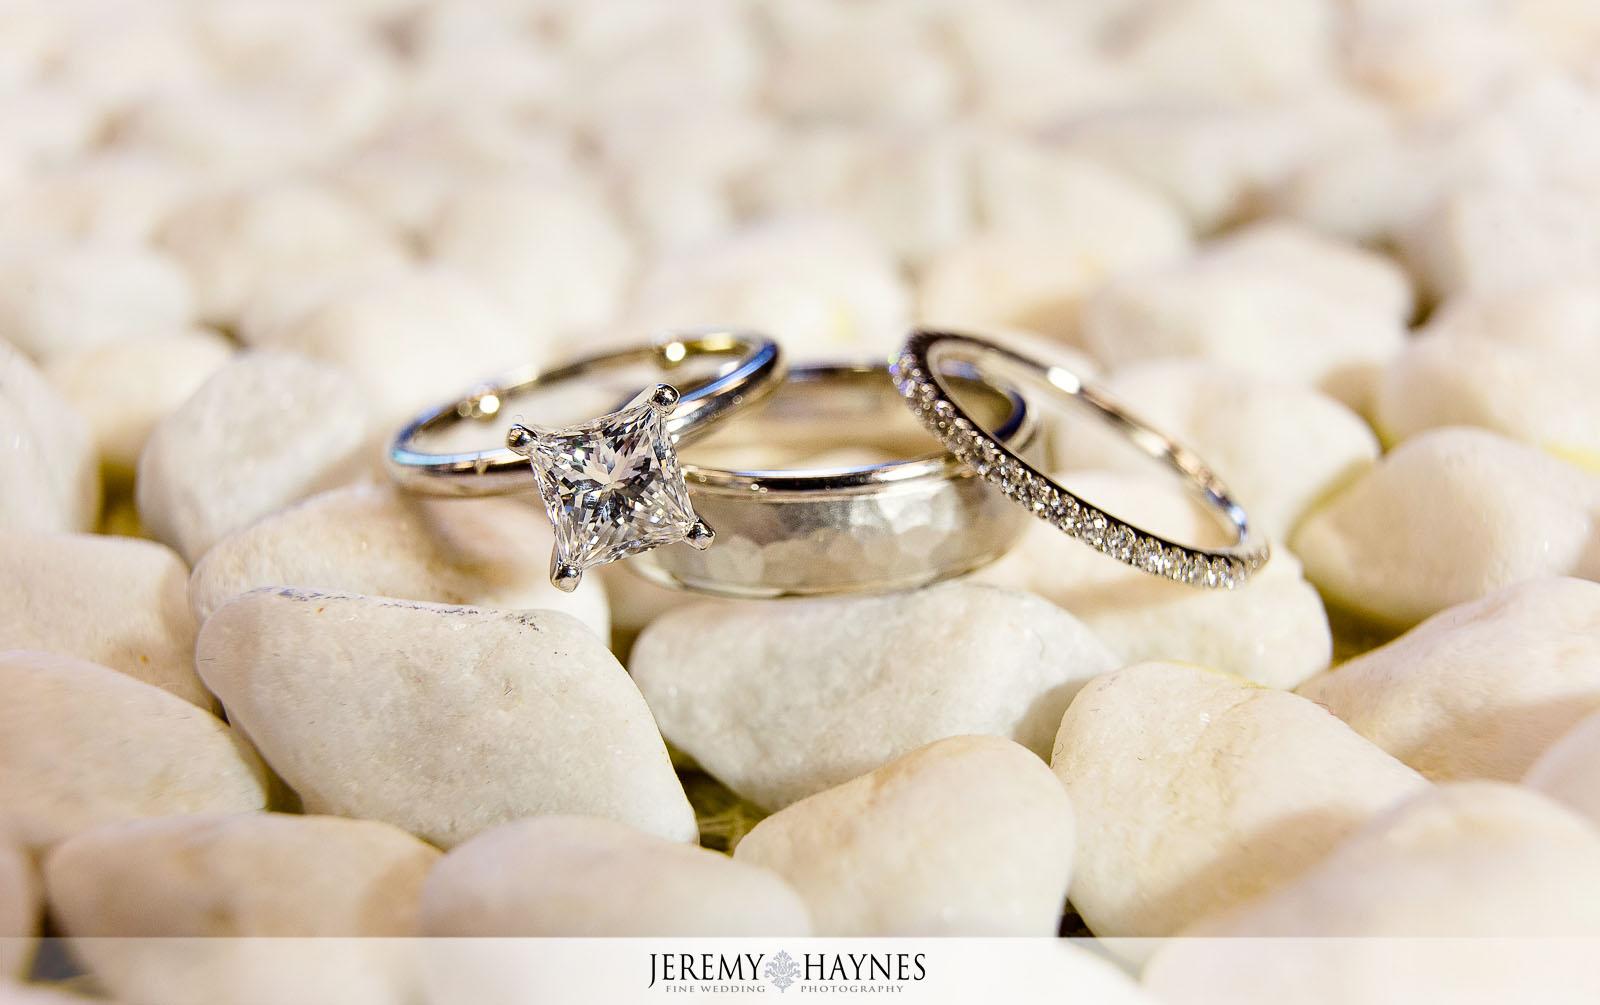 artistic-wedding-rings-photos-carmel